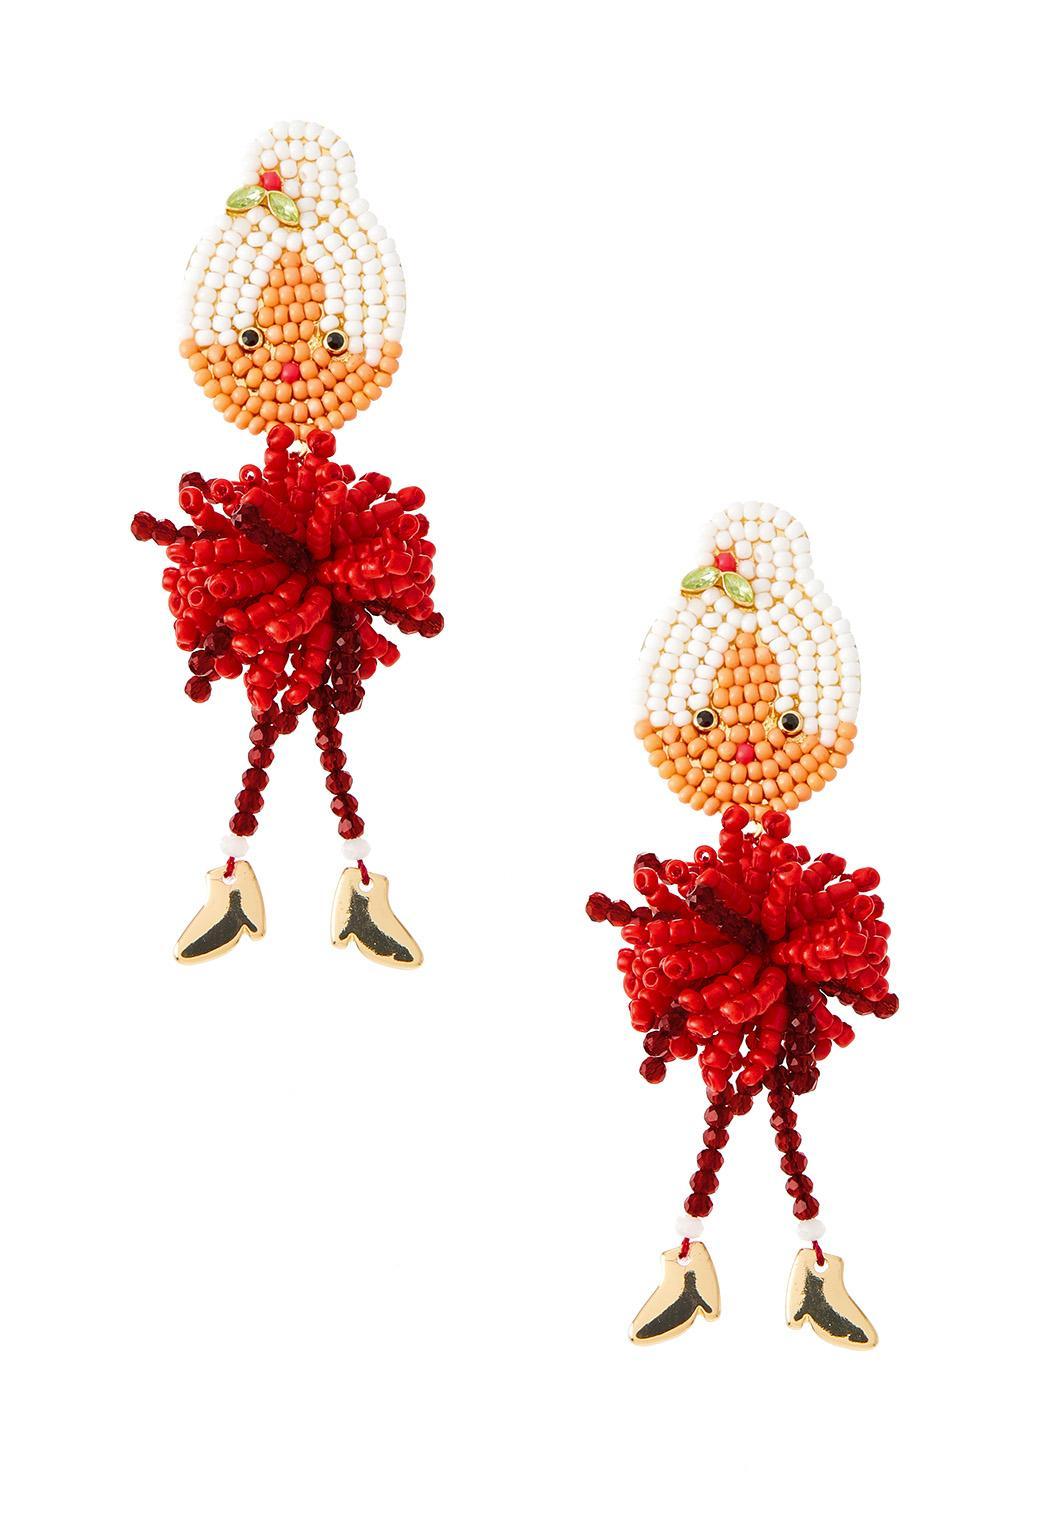 Mrs. Clause Seed Bead Earrings